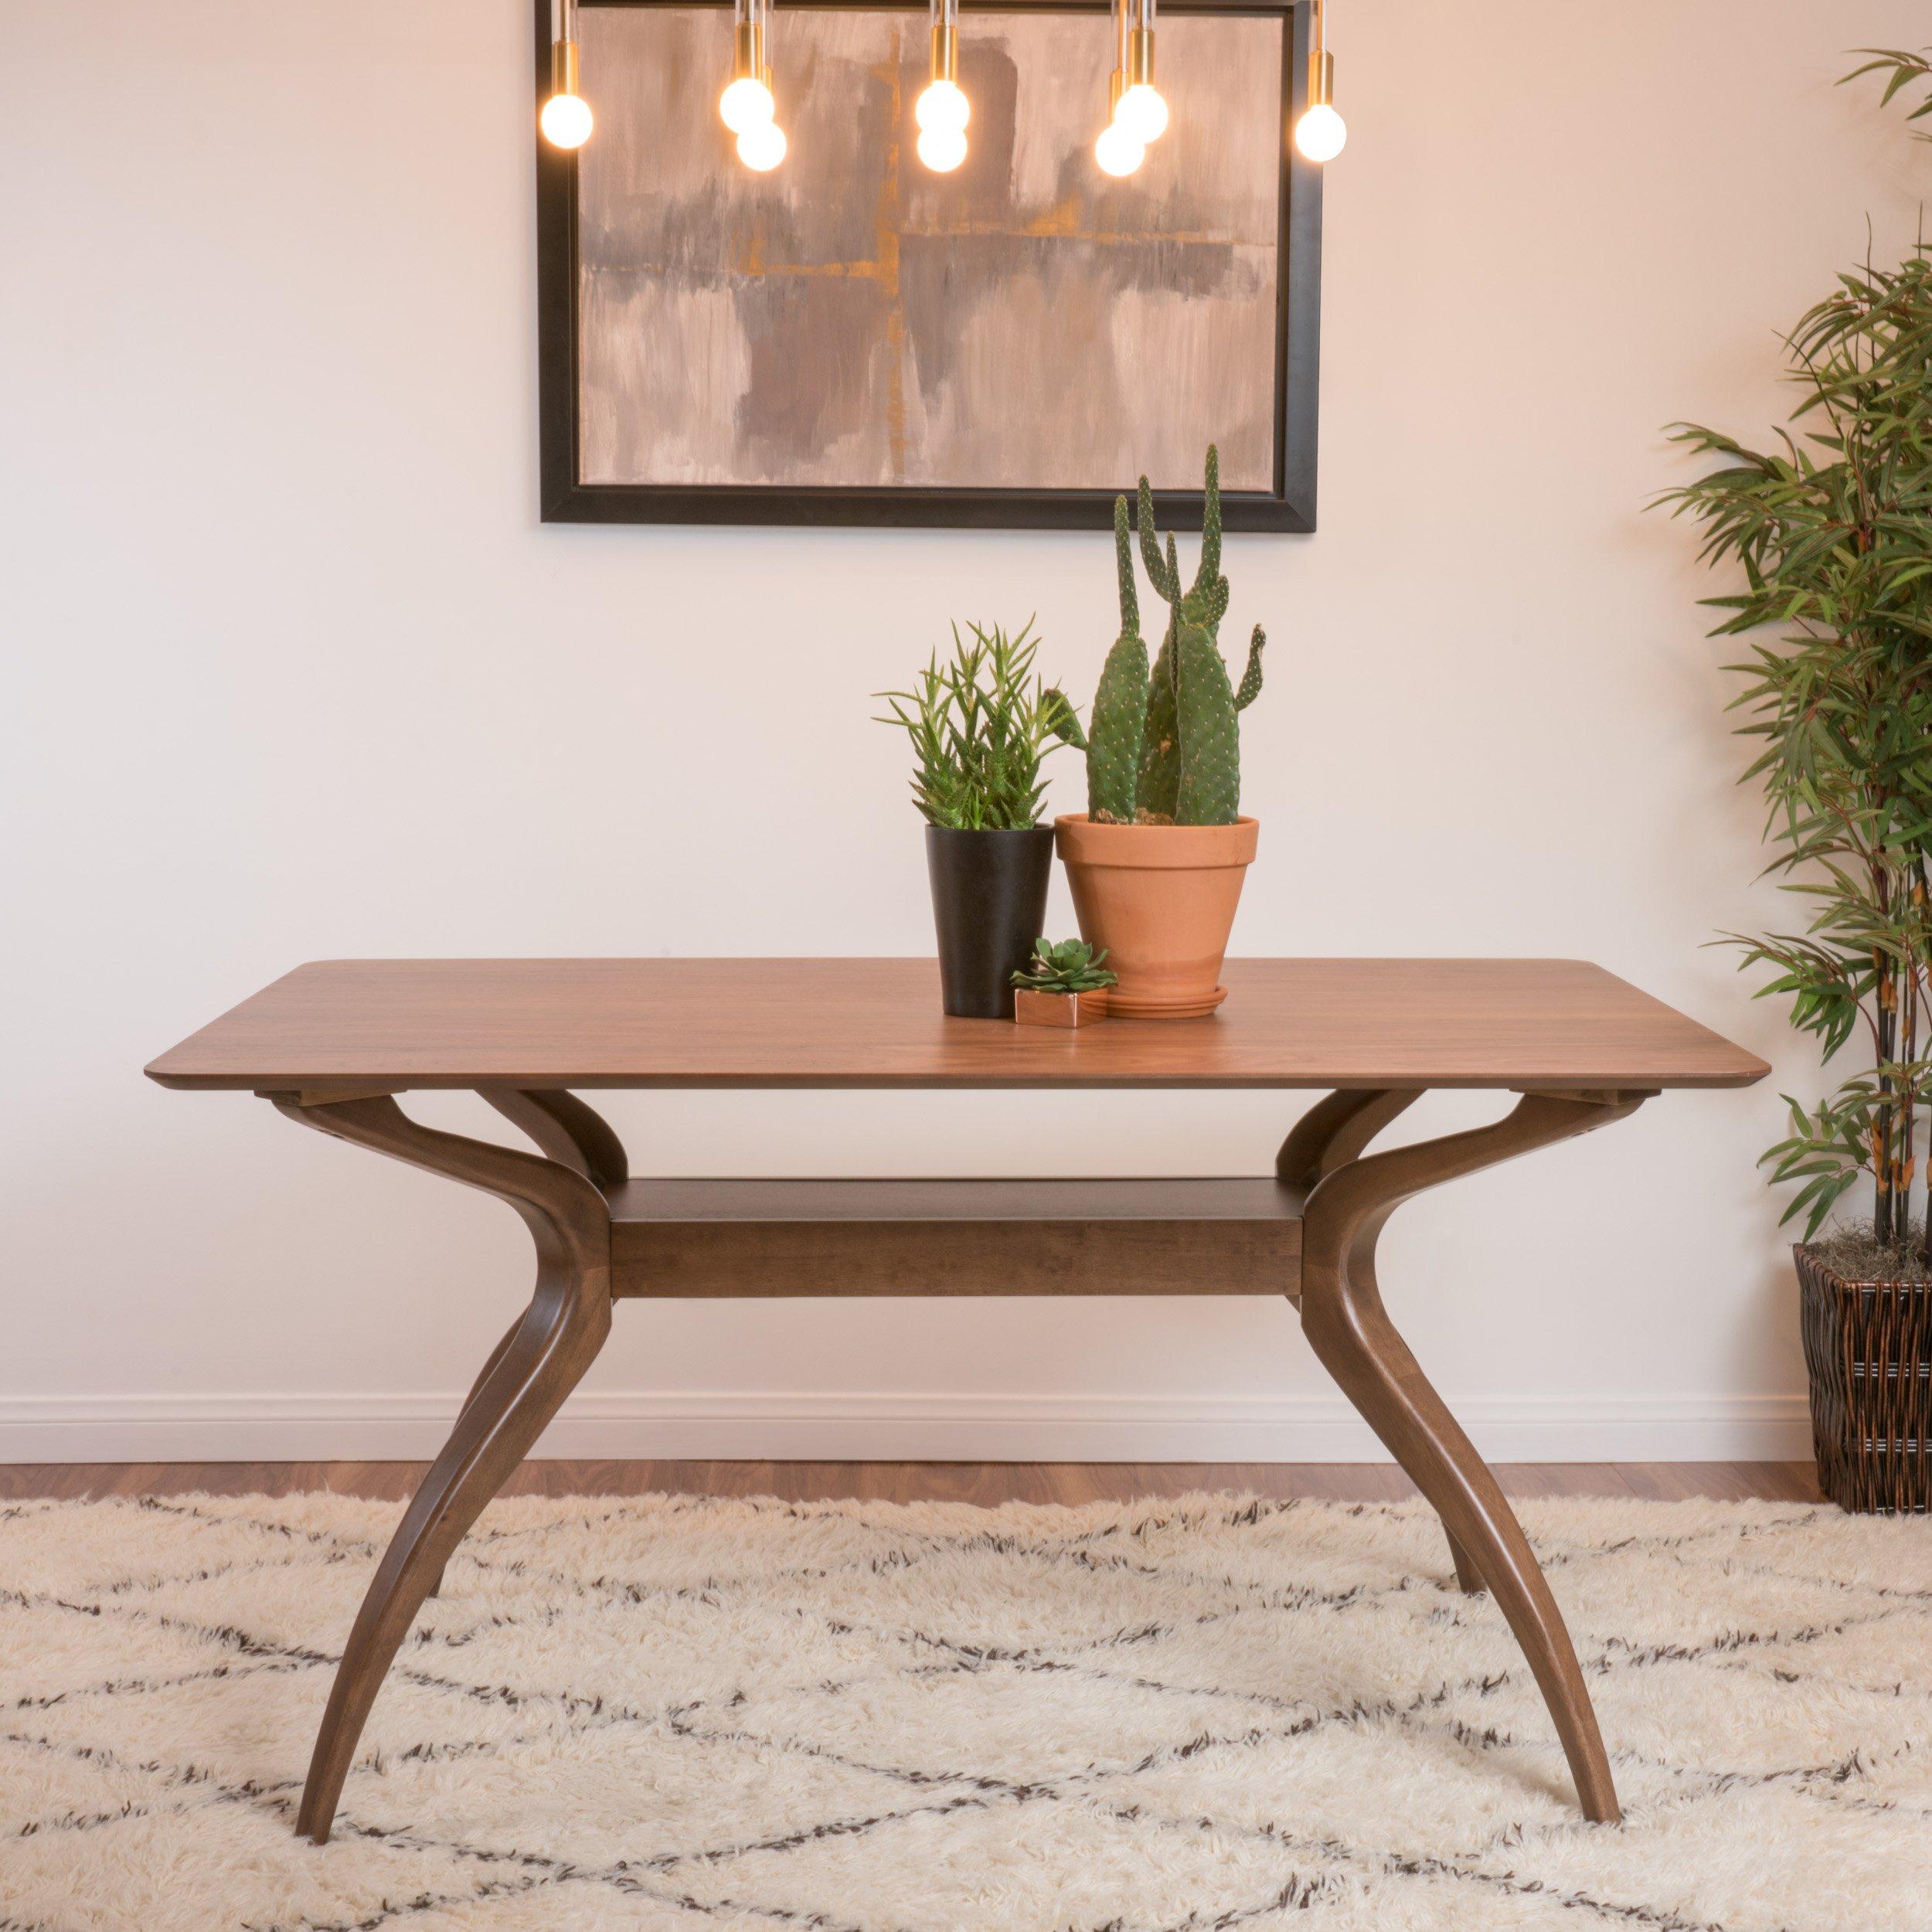 Mabel Natural Walnut Finish Wood Mid Century Modern Dining